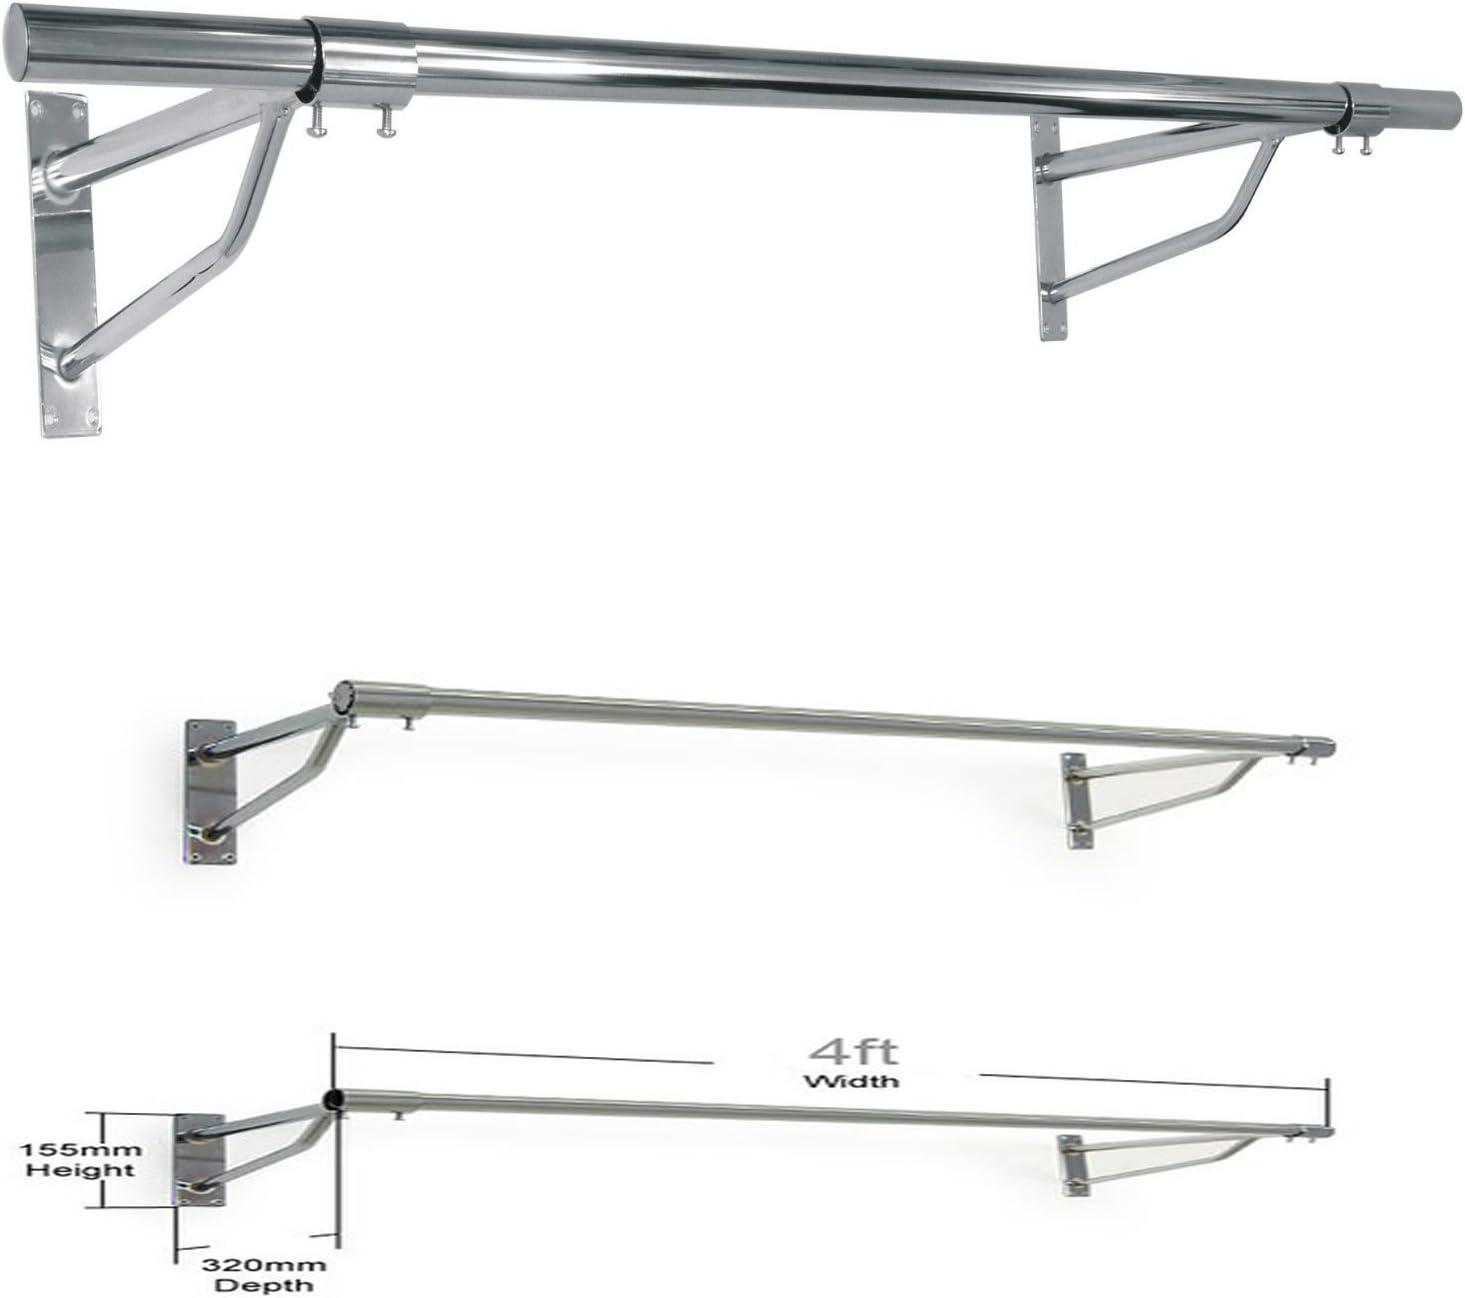 Heavy Duty Wall Mounted Garment Rail Hanging Rack 300mm 3000mm Storage Display